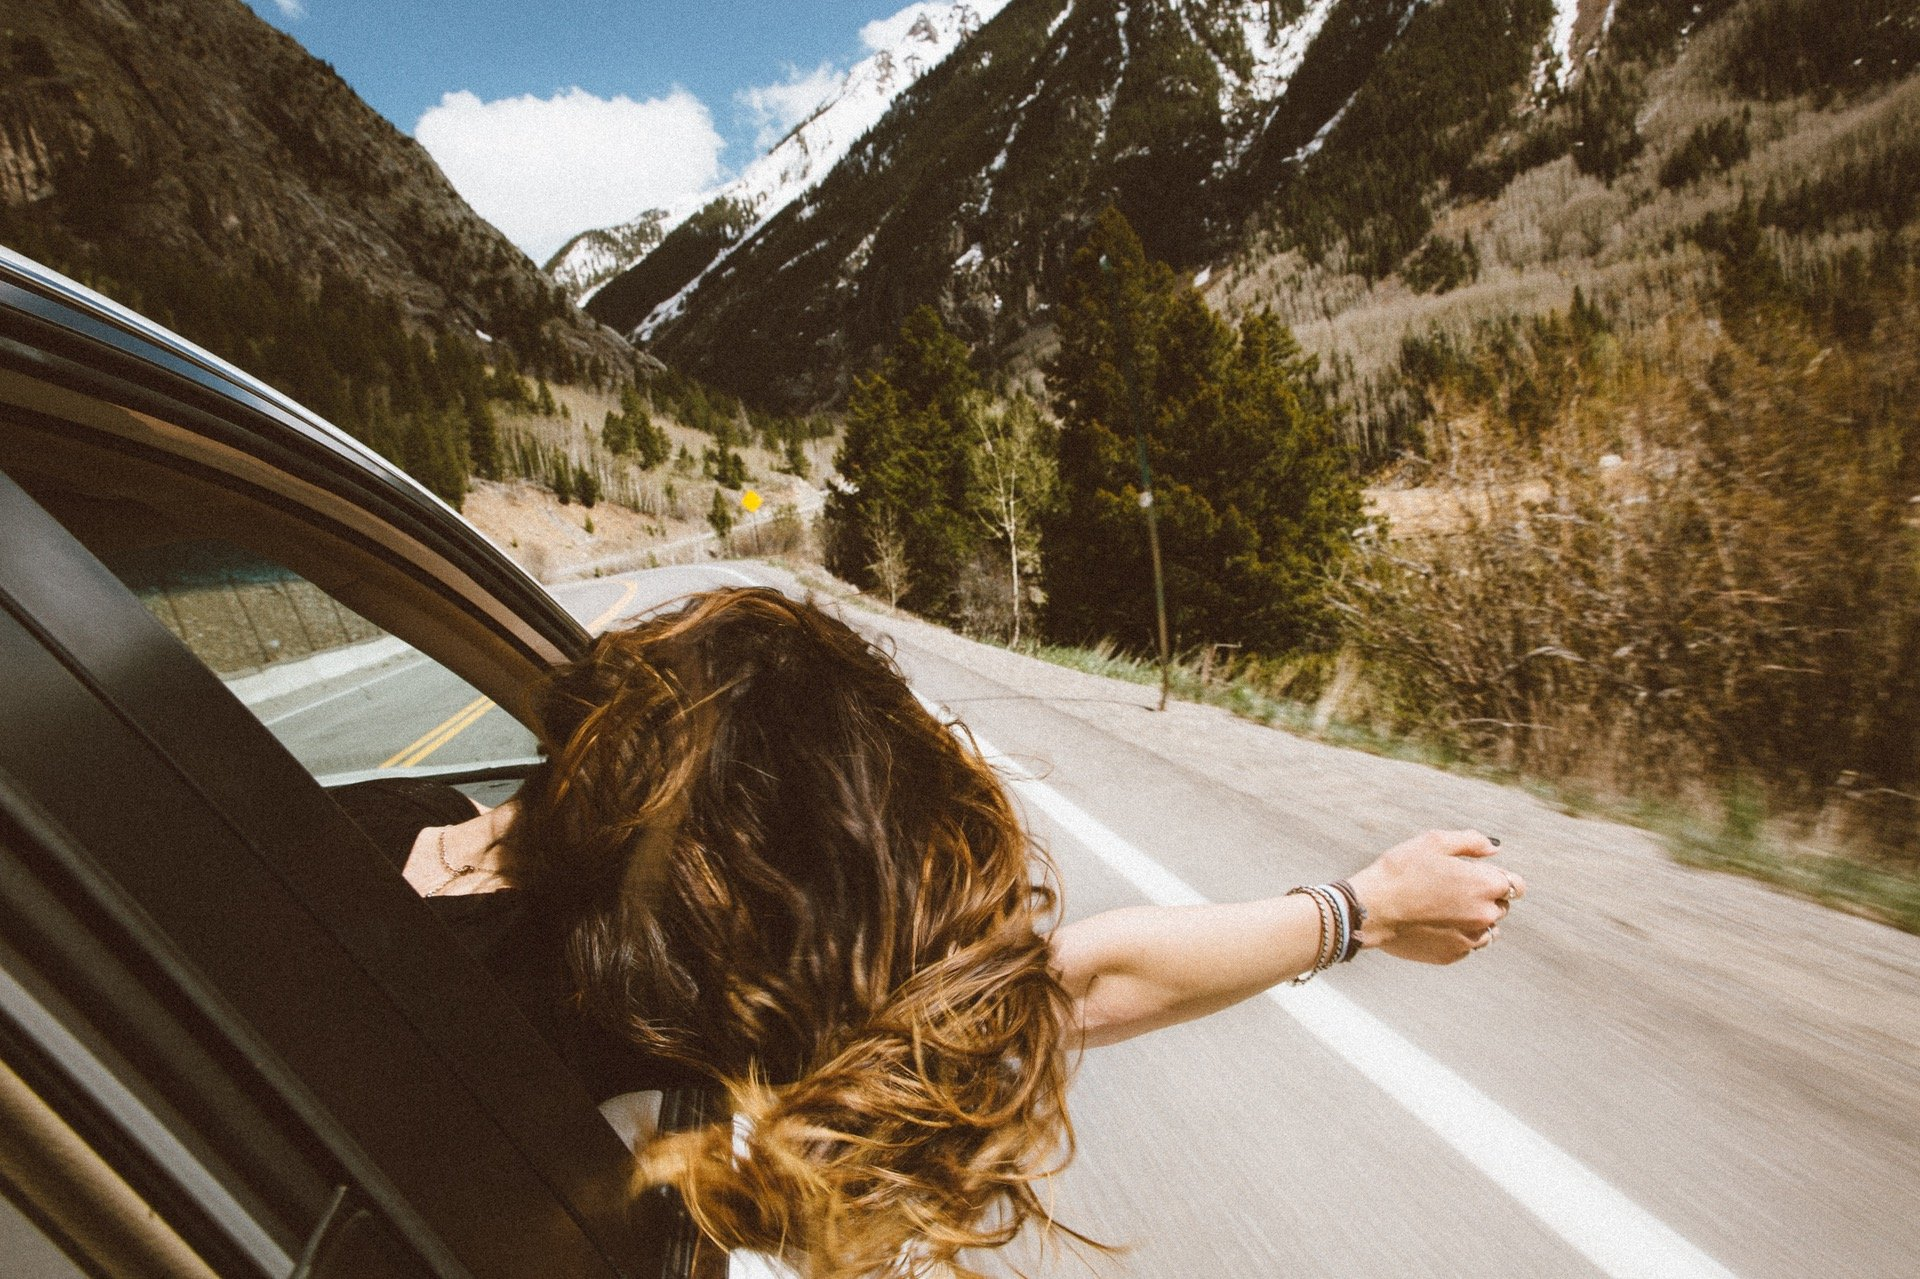 6 Tactics to Prevent Burnout & Manage Stress